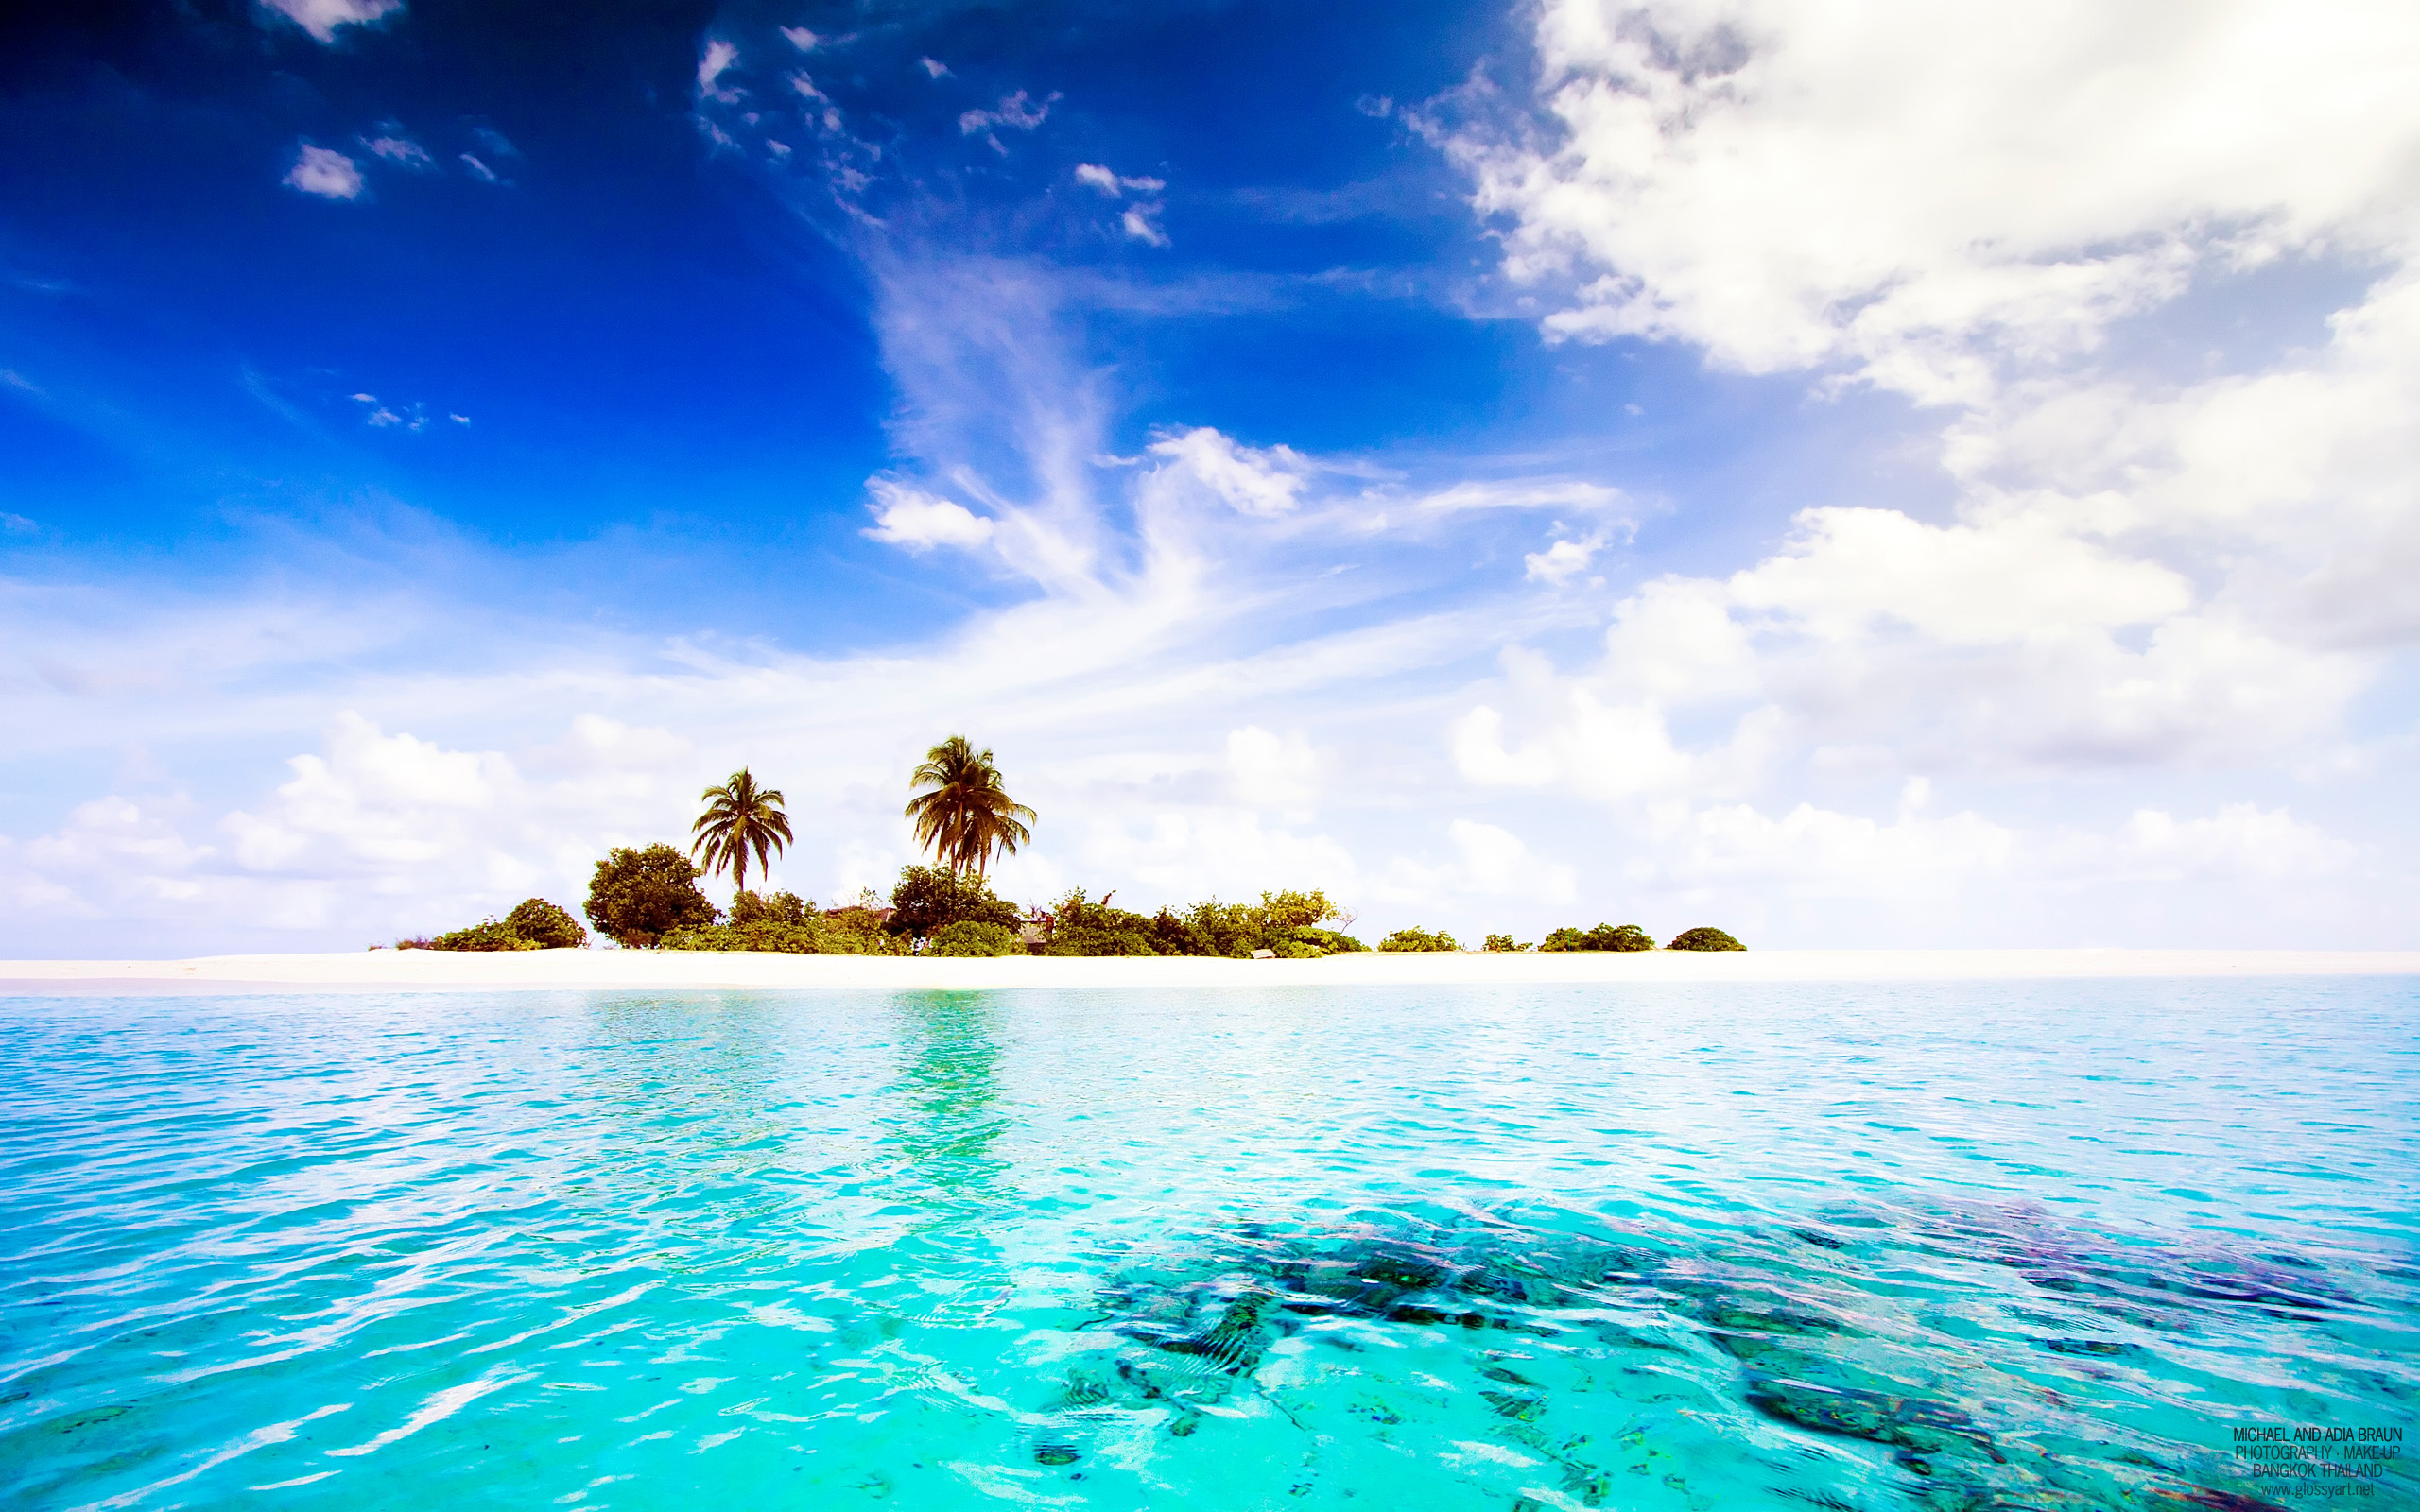 Maldives Diggiri Island Wallpapers HD Wallpapers 2560x1600